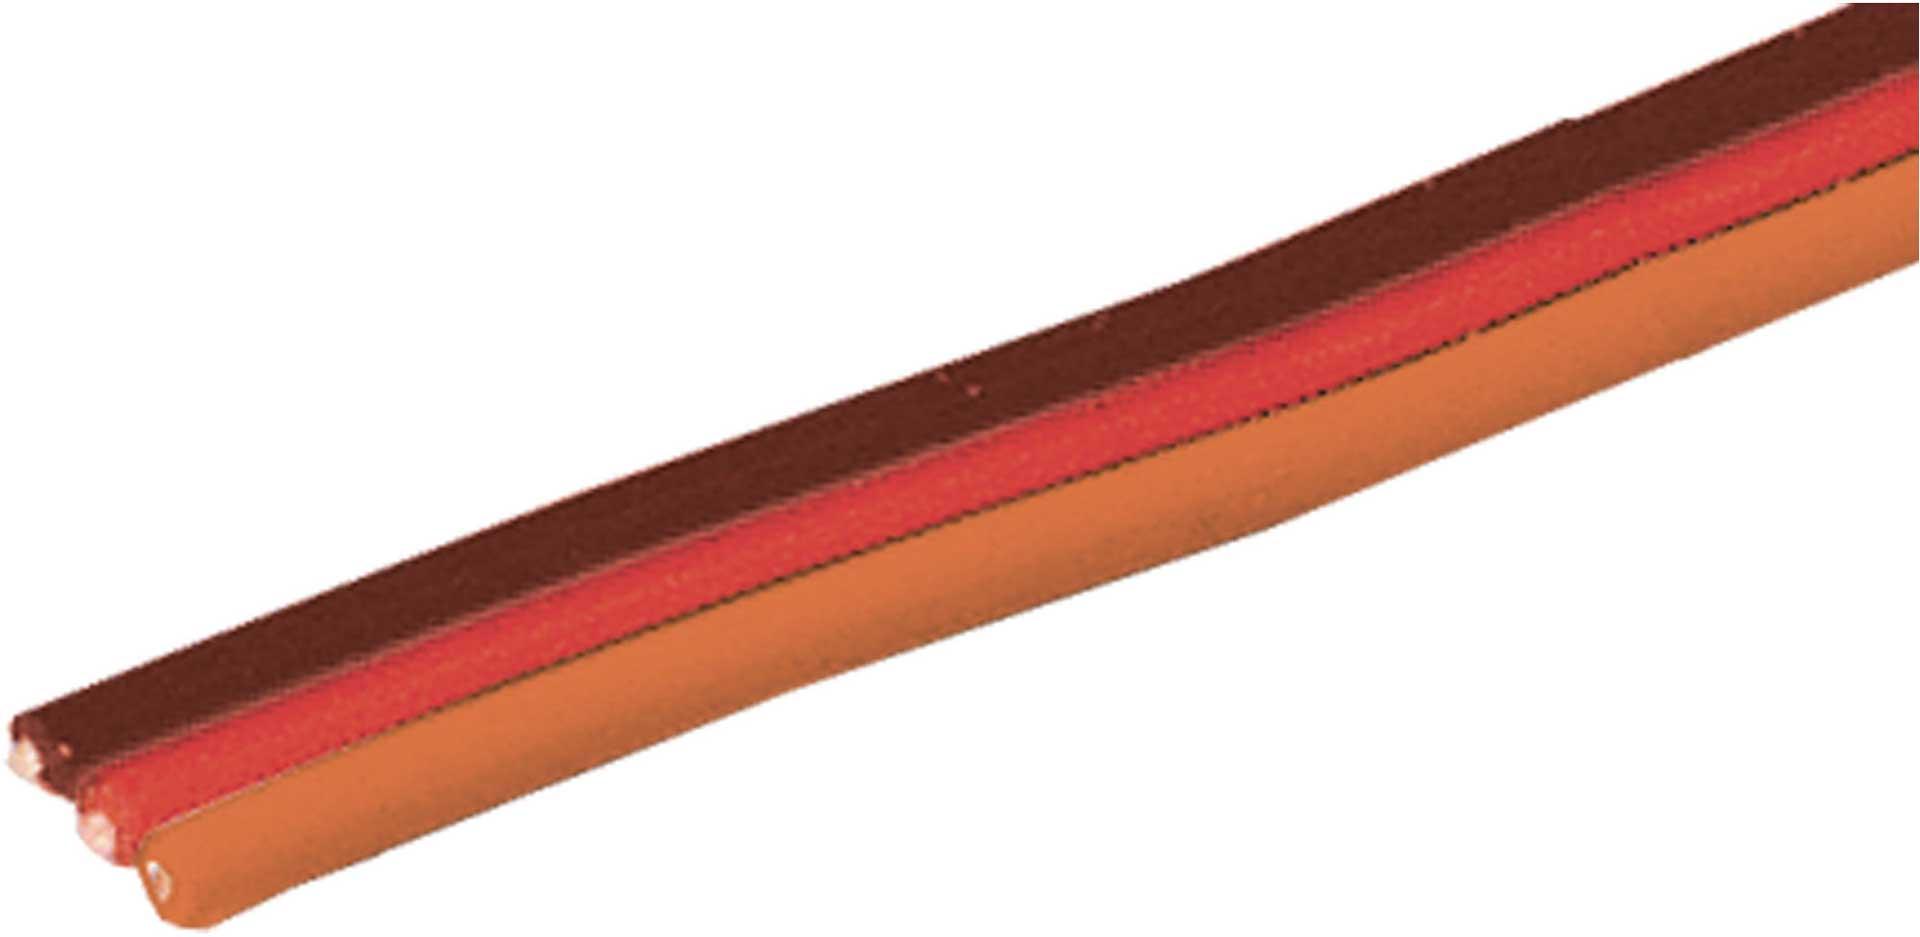 ROBBE SERVO CABLE GRAUPNER/JR/UNI FLAT 0.33MM² (22AWG) 10 METER